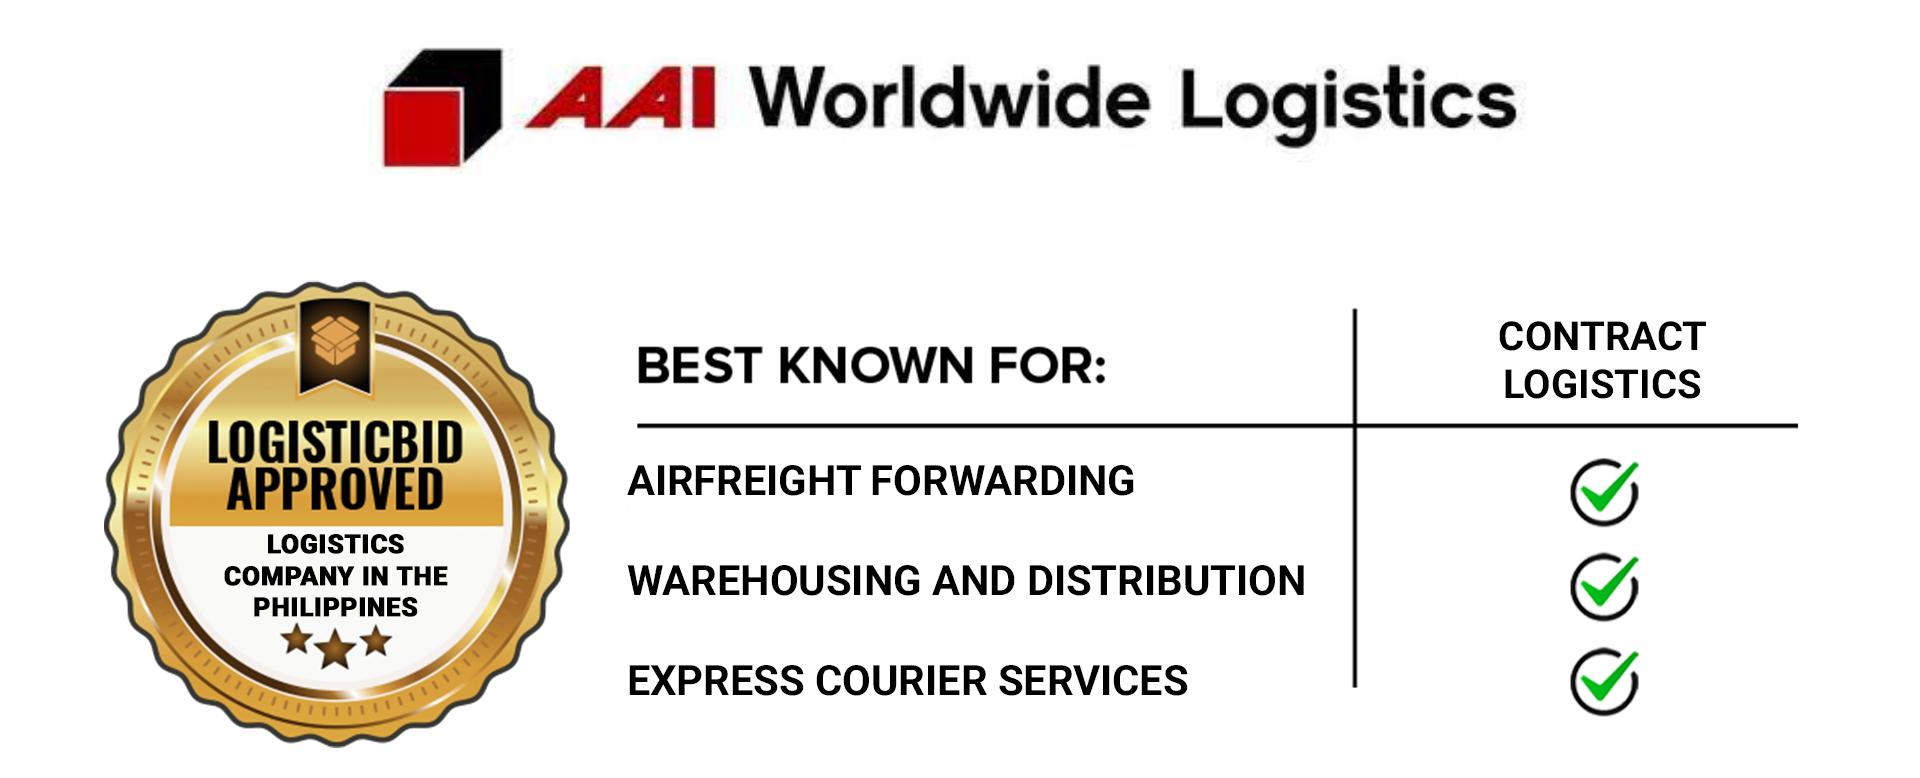 AAI Worldwide Logistics